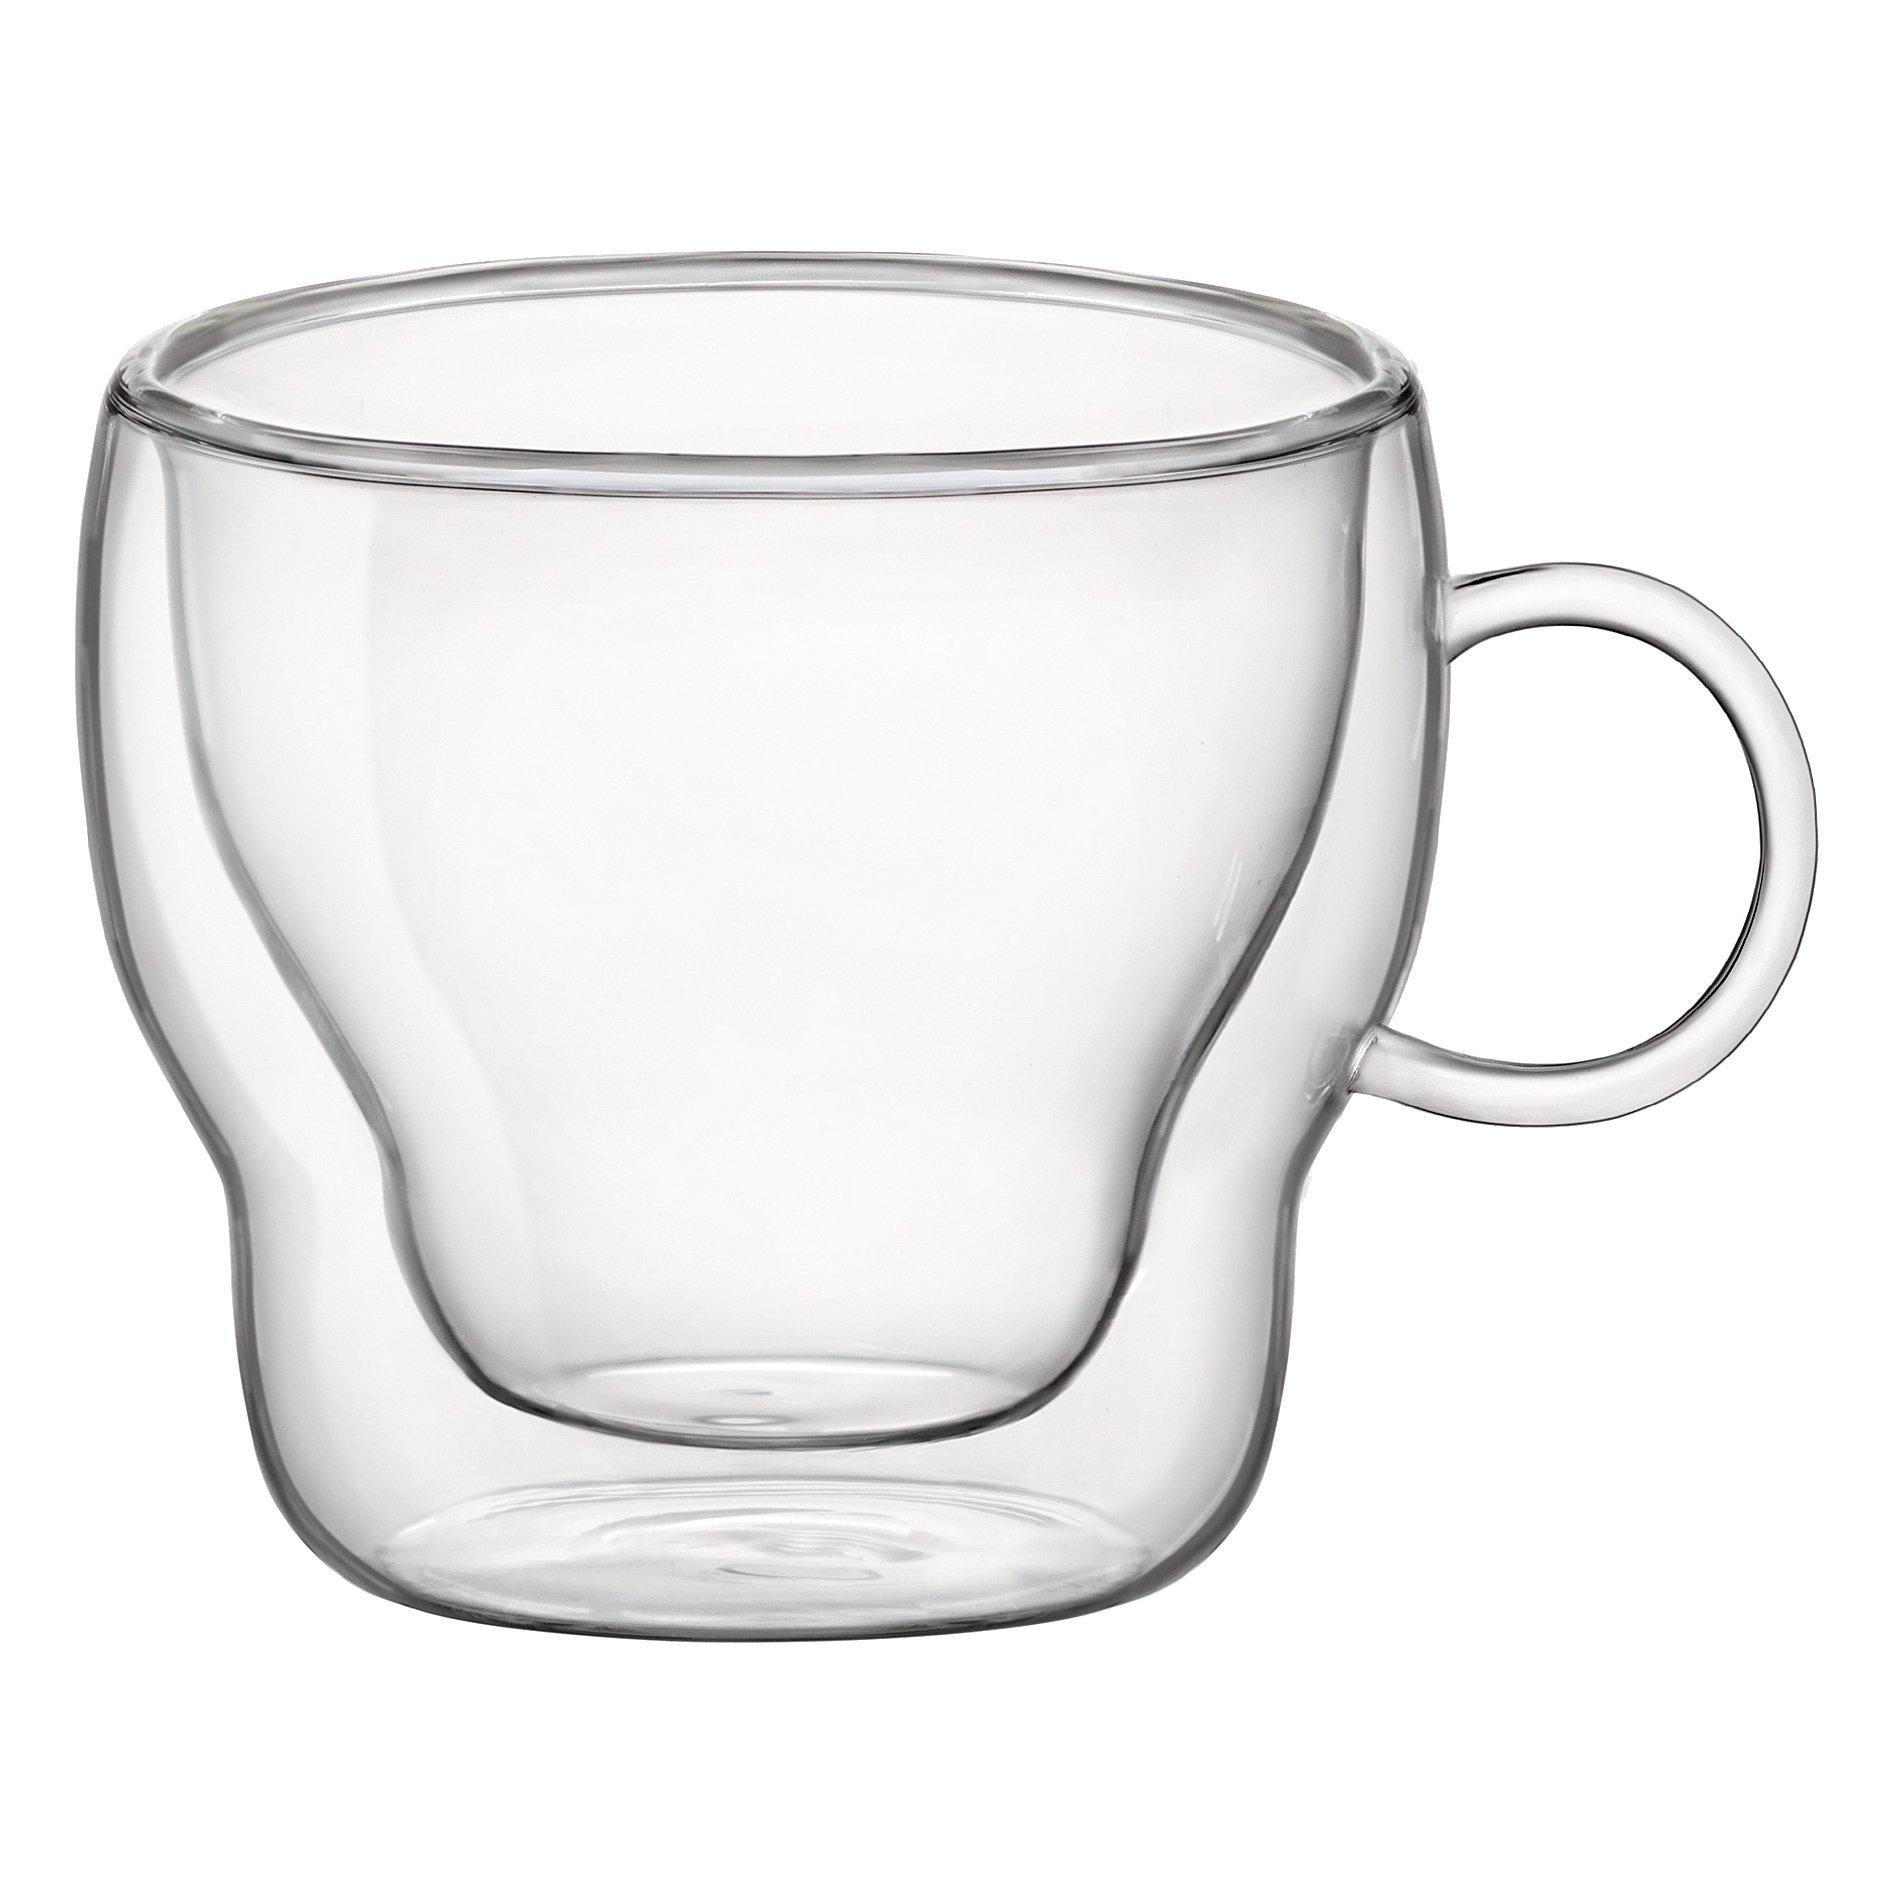 Bormioli Rocco Double Wall Glass 3 Ounce Espresso Mug, Set of 2